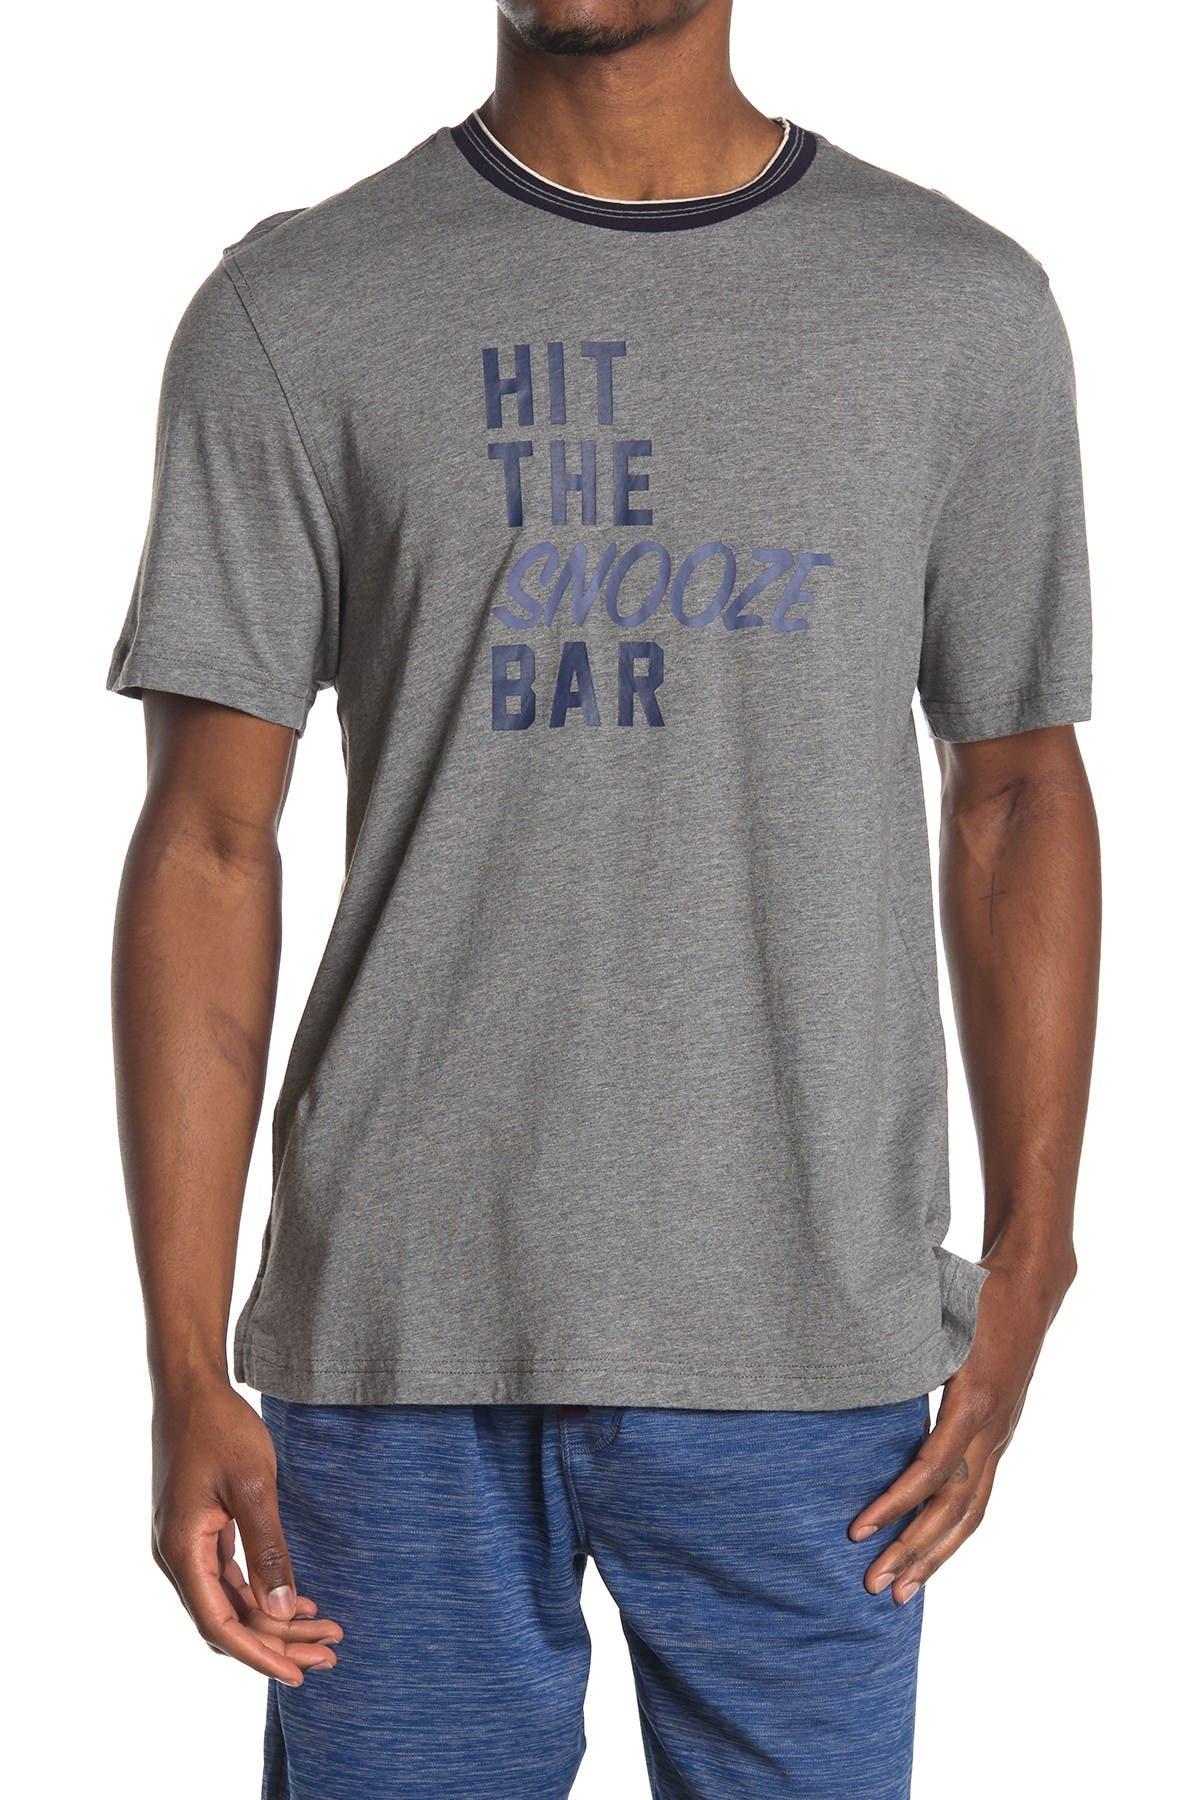 Image of Tommy Bahama Snooze Bar Pajama T-Shirt